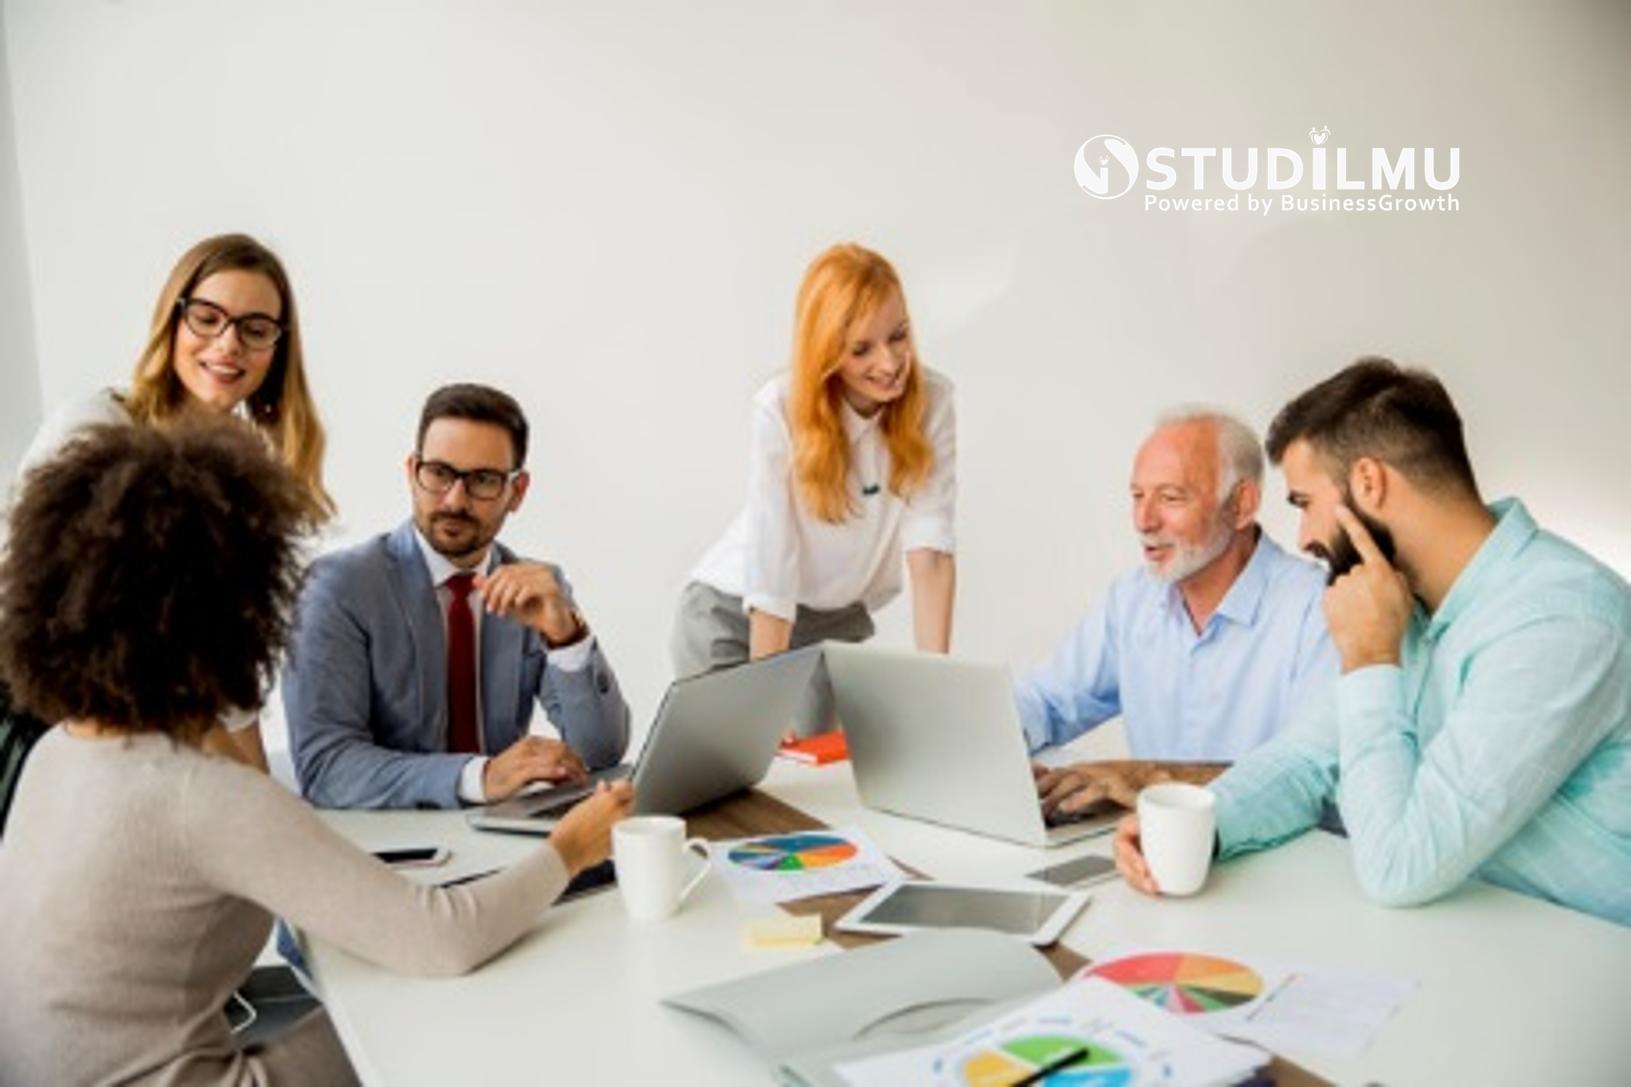 STUDILMU Career Advice - 5 Tips untuk Rapat Kerja yang Lebih Baik